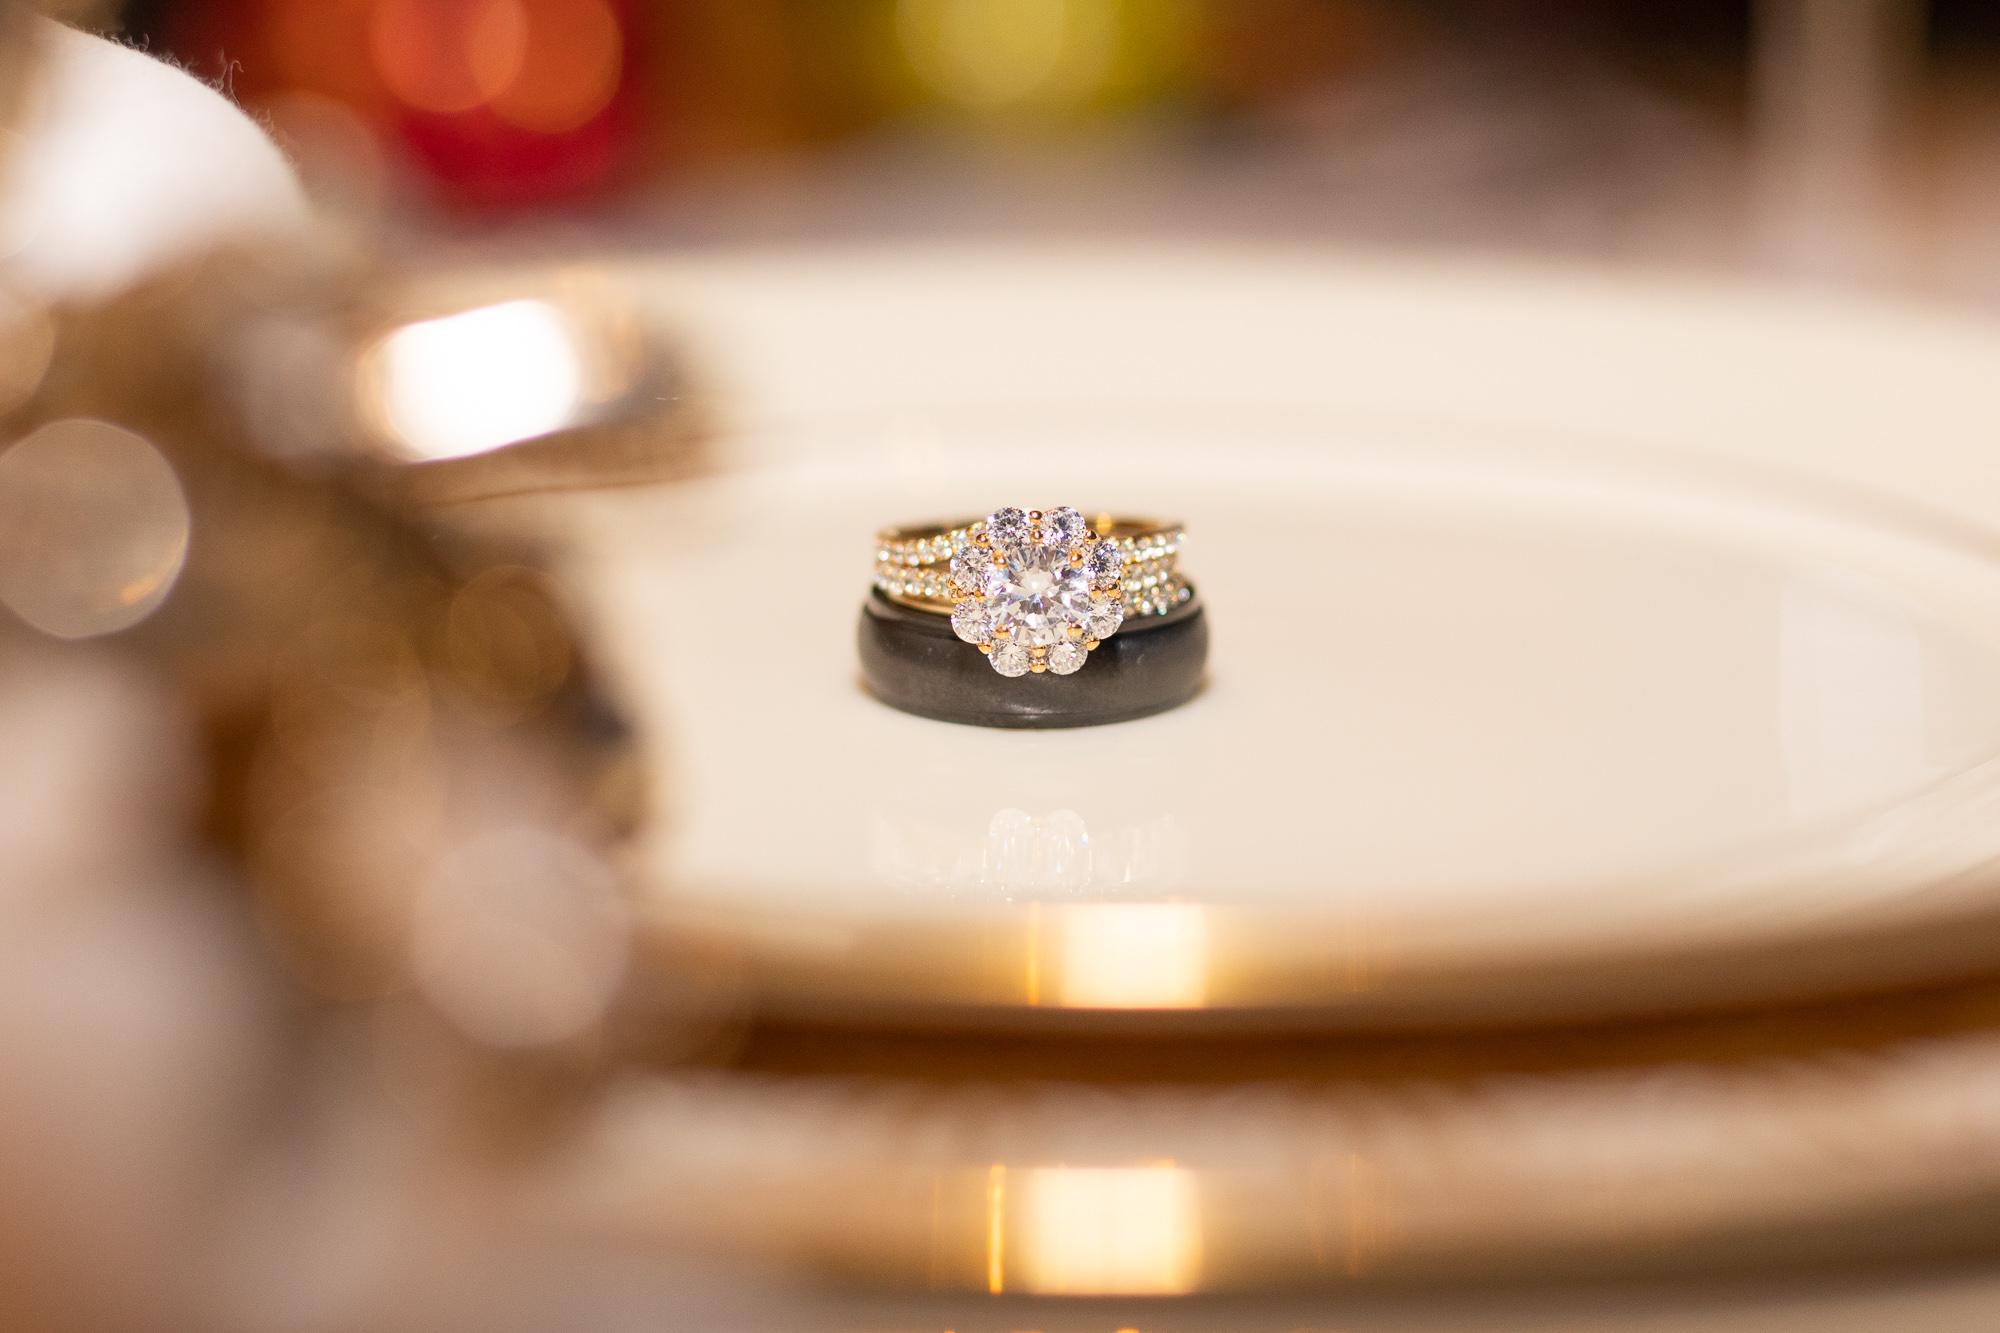 Kimpel's Jewelers wedding rings at autumn wedding styled shoot at The Gathering Place at Darlington Lake.